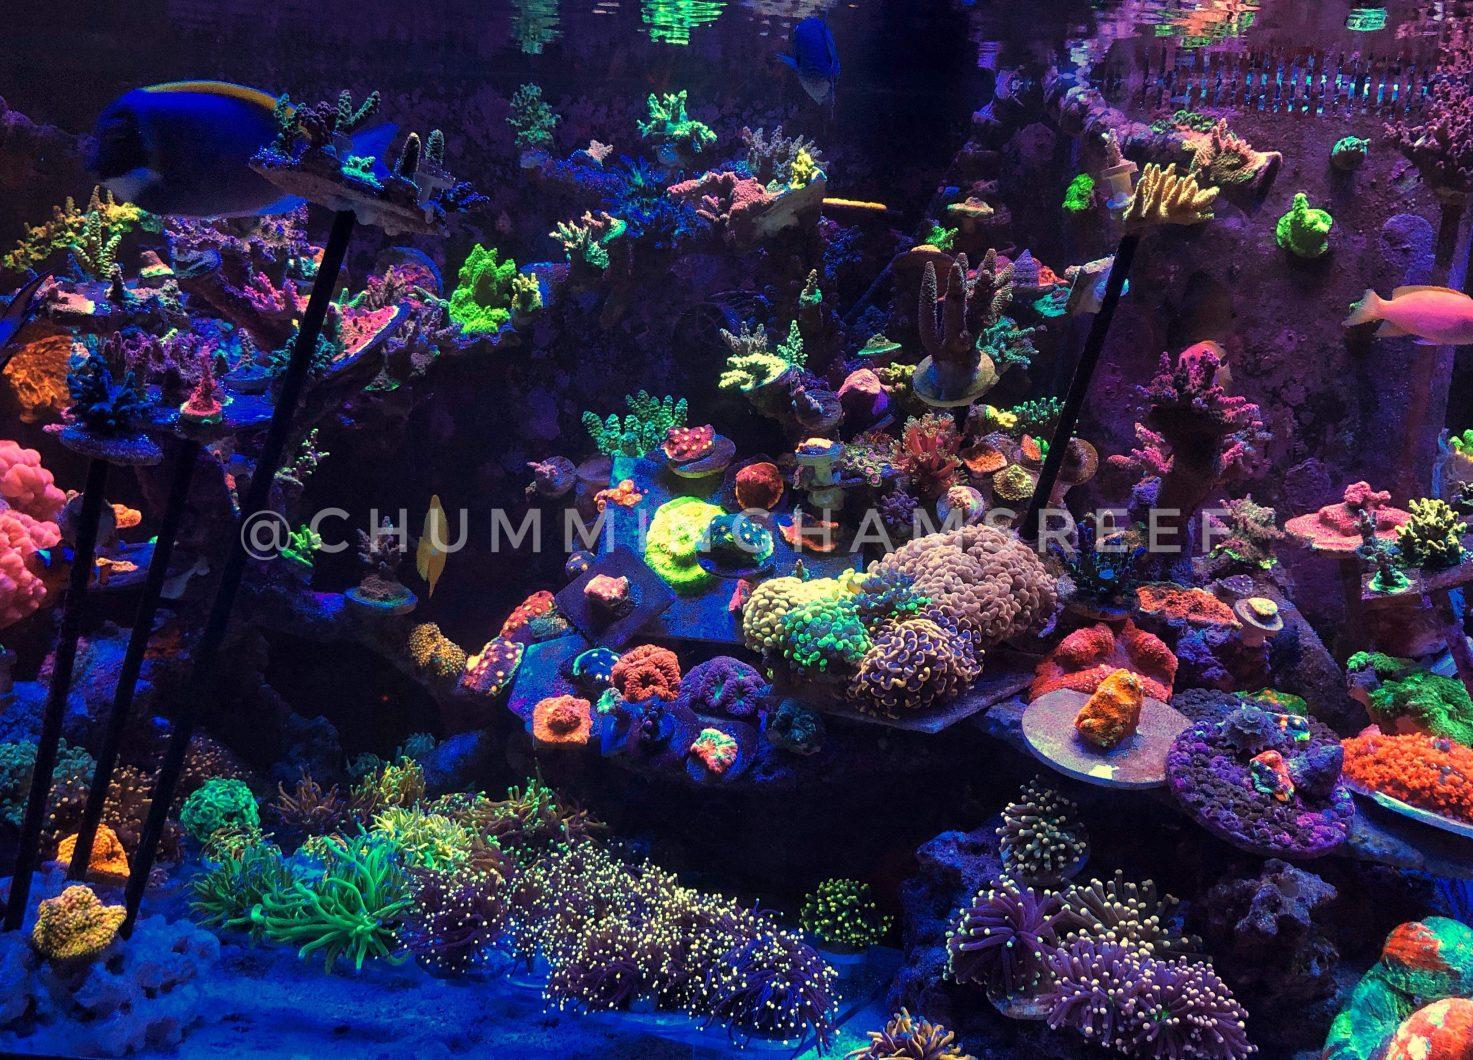 En iyi resif LED ışık akvaryum 2020